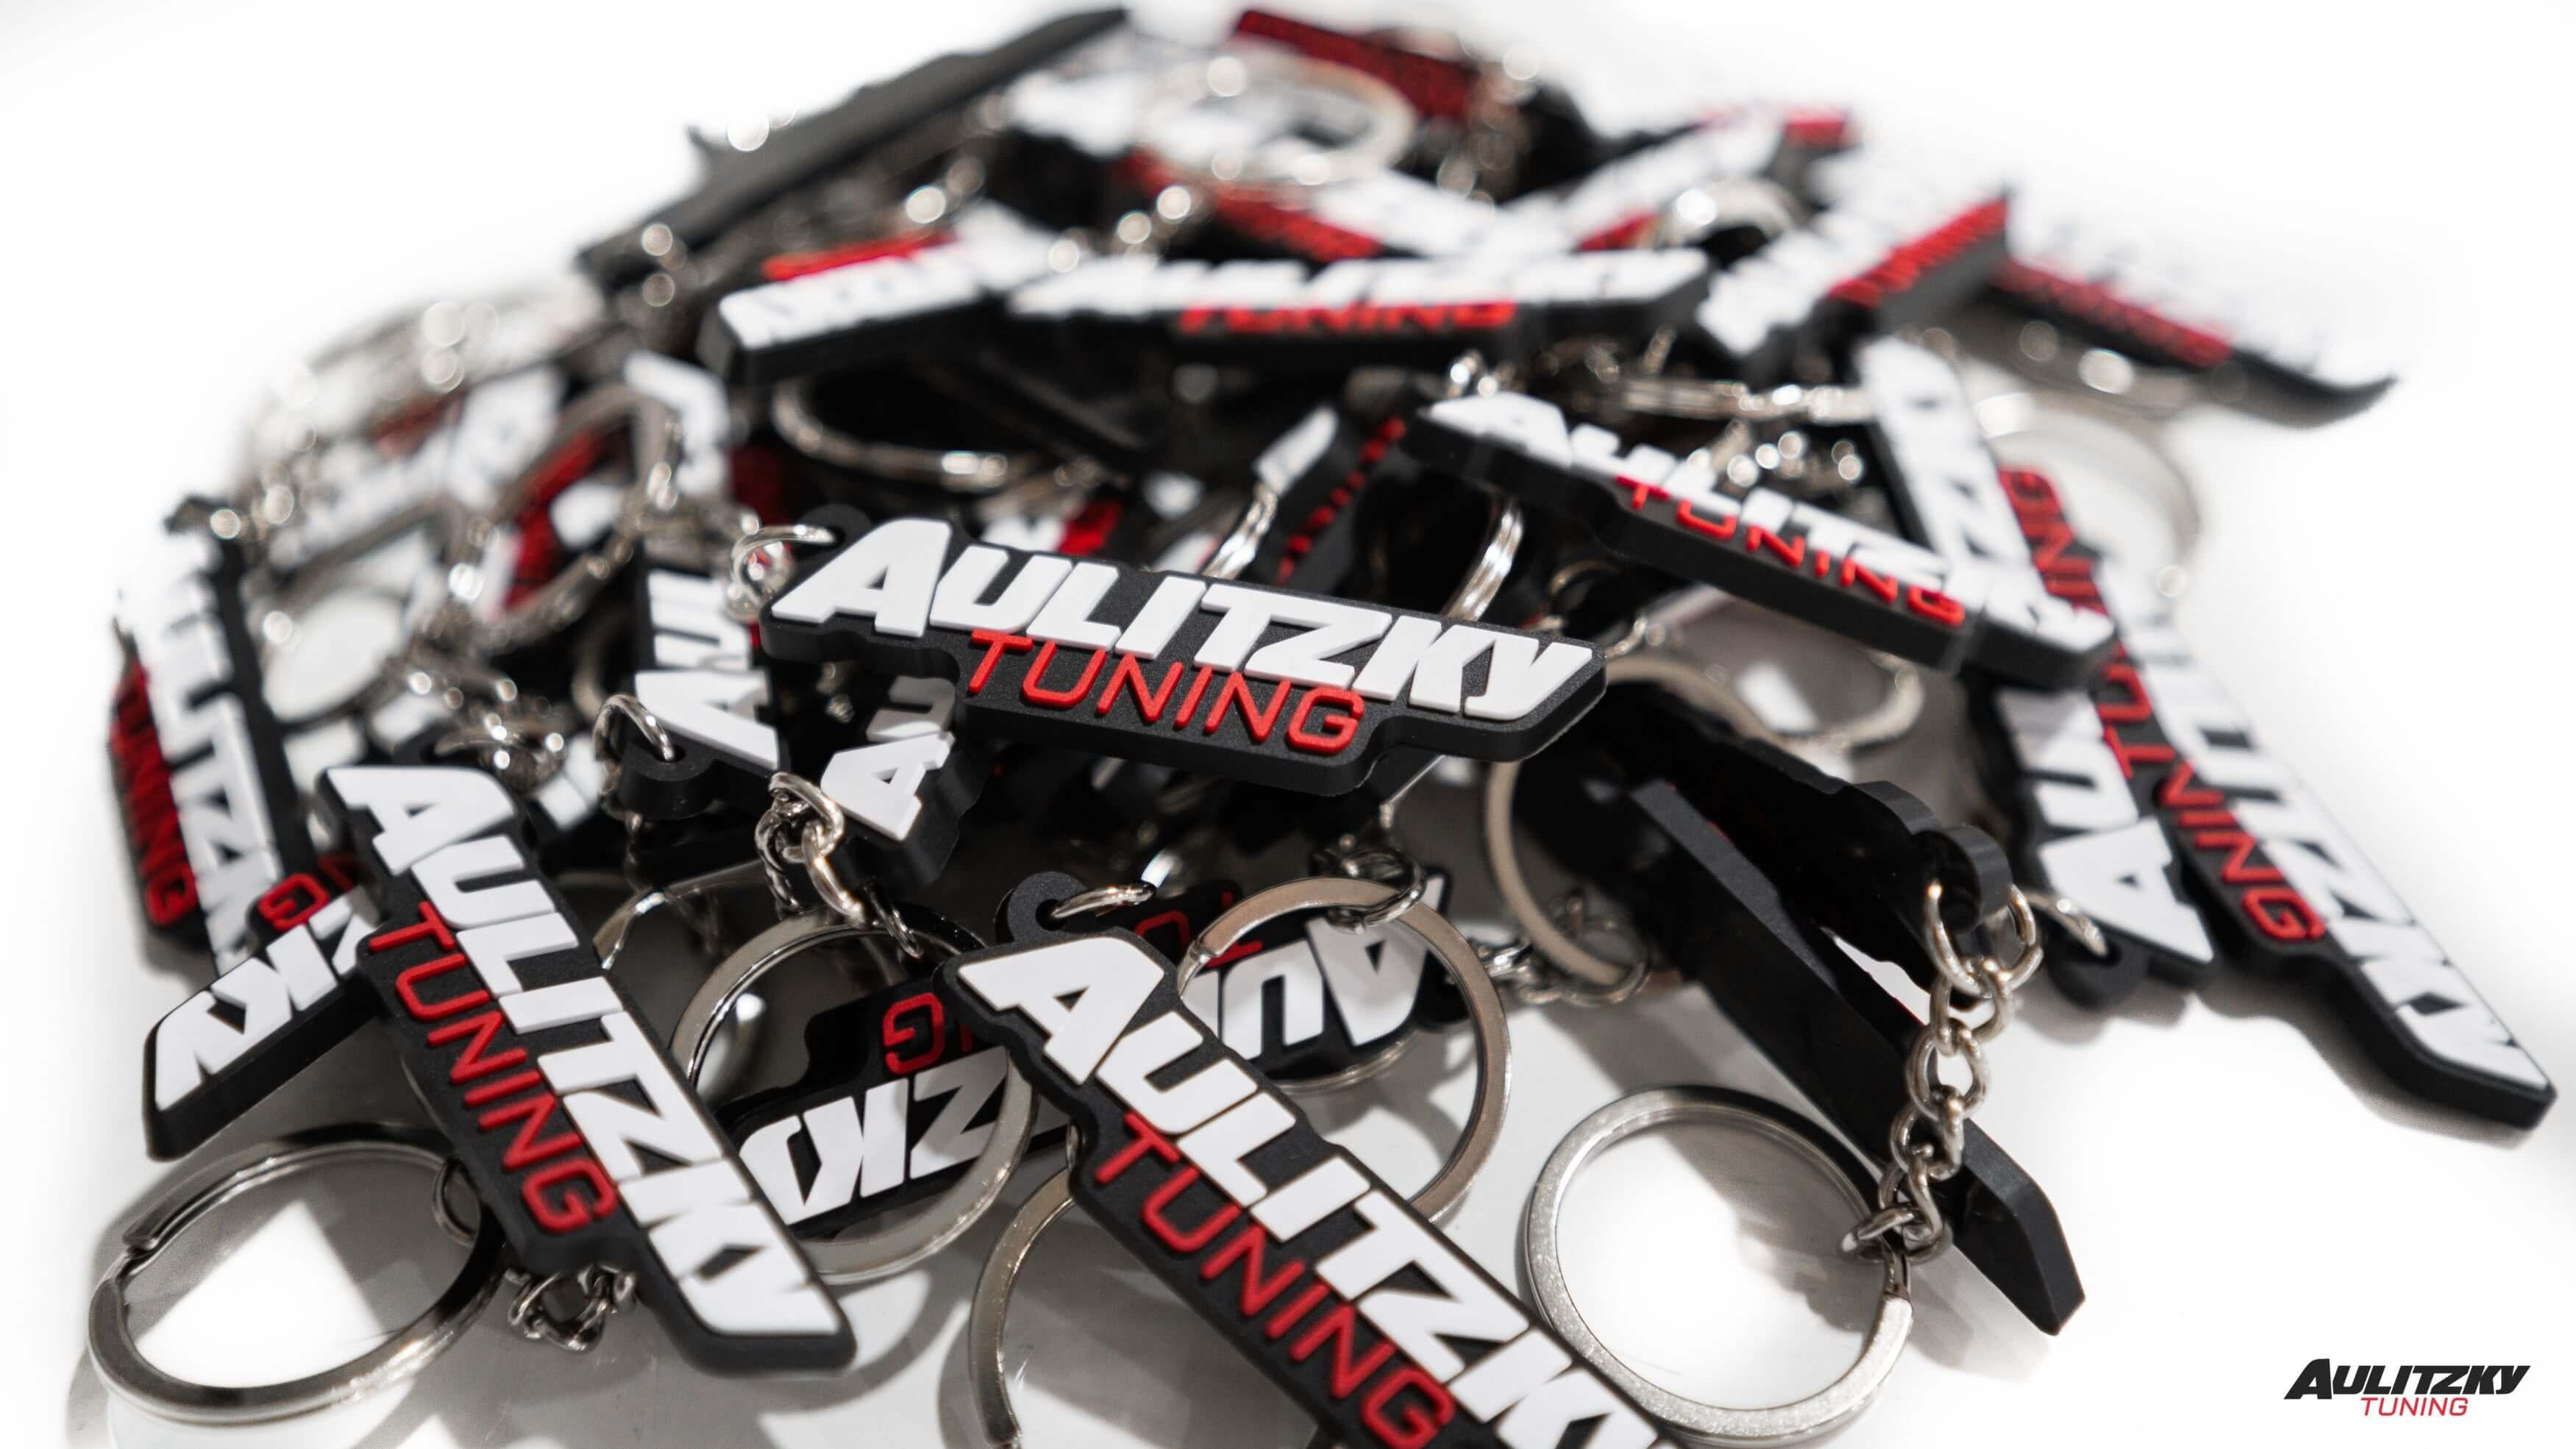 "Aulitzky Tuning   Schlüsselanhänger   Aulitzky Tuning Logo   ""Aulitzky-Edition"""